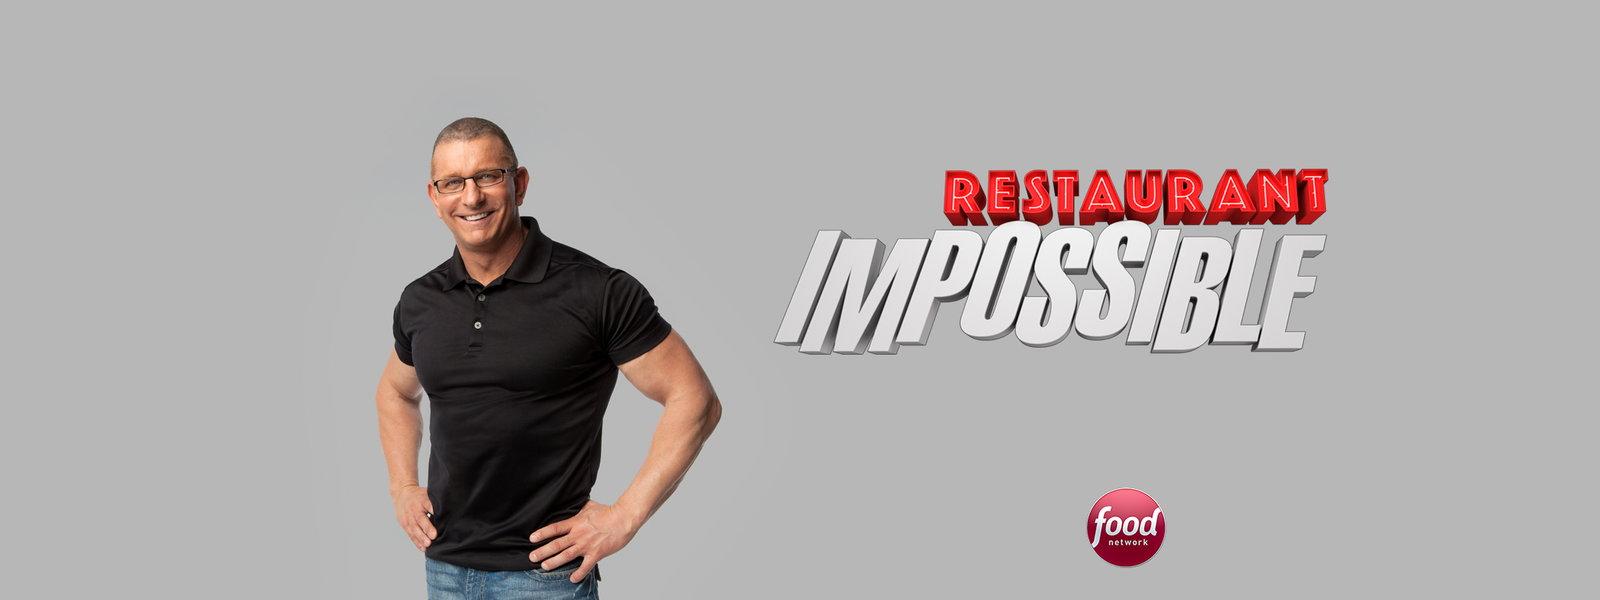 Restaurant: Impossible Episodes | Hulu